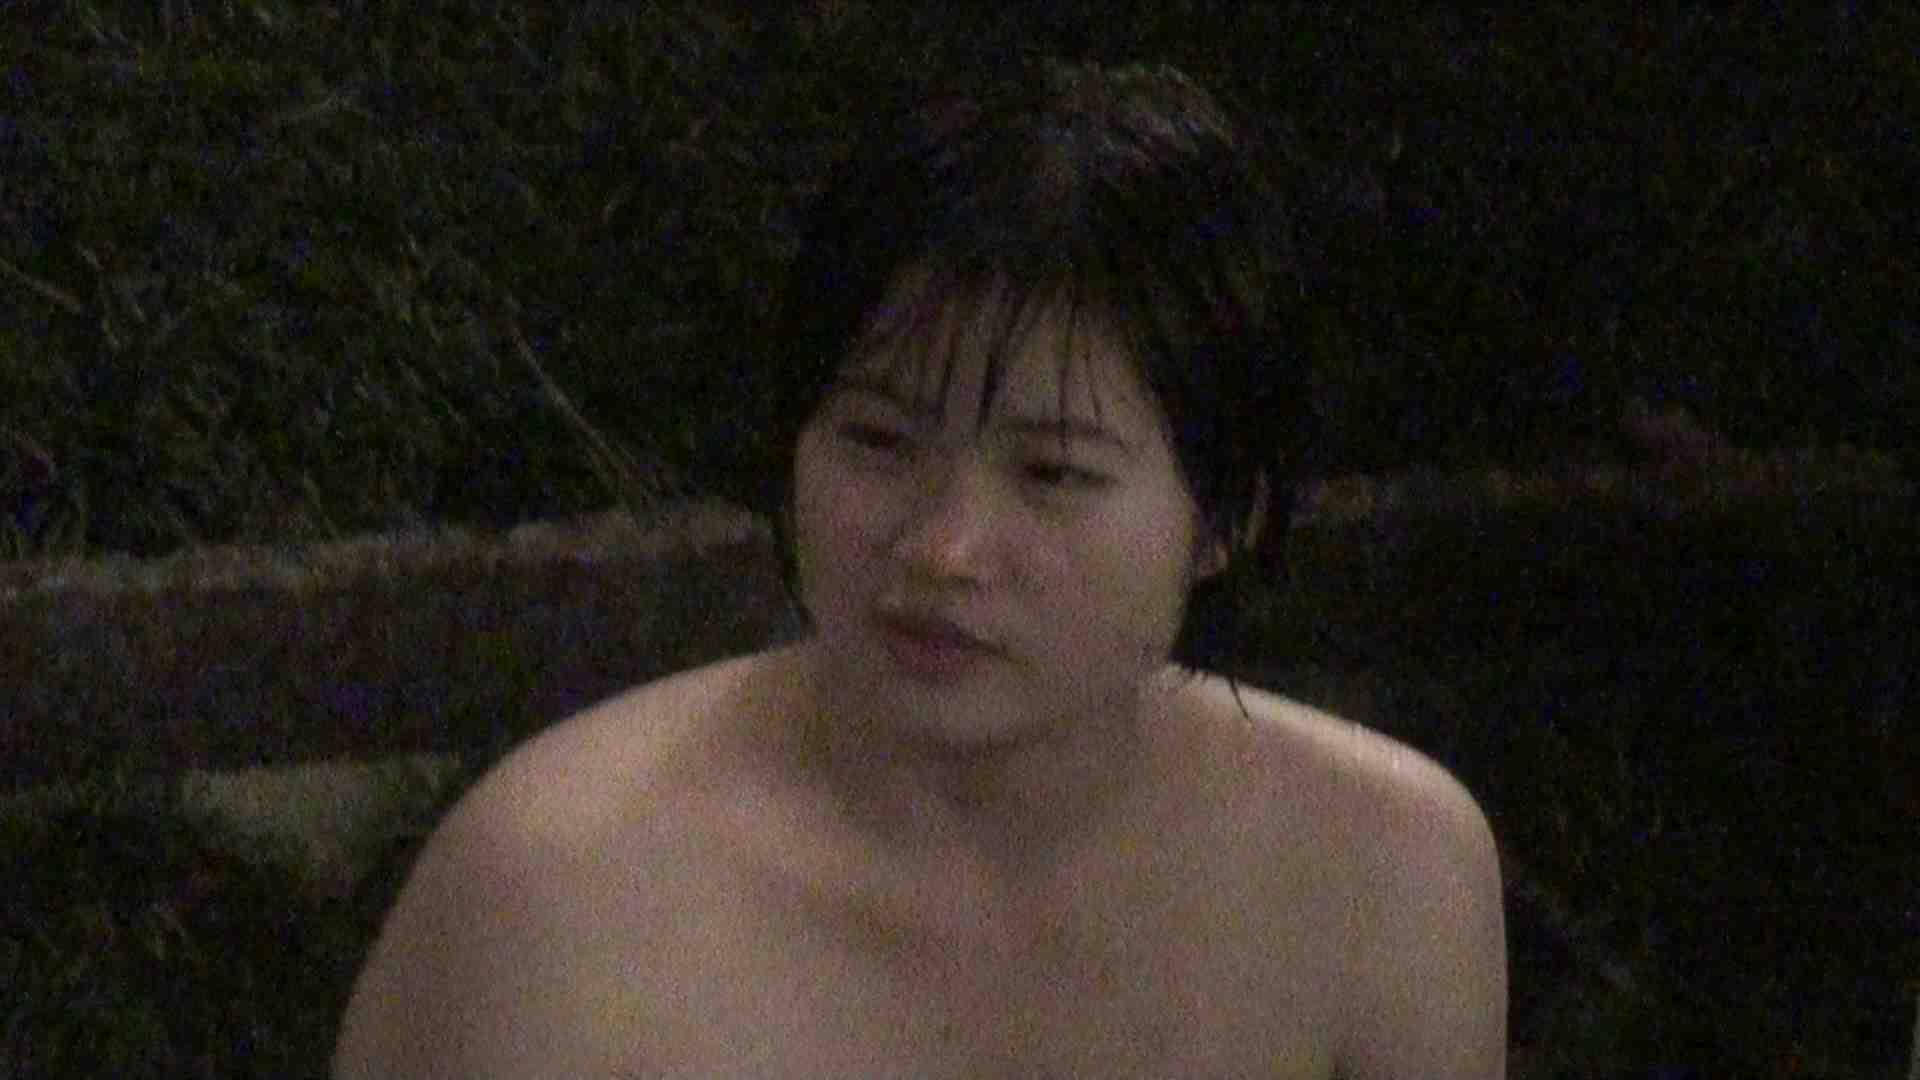 Aquaな露天風呂Vol.384 盗撮シリーズ | 露天風呂編  113PIX 43